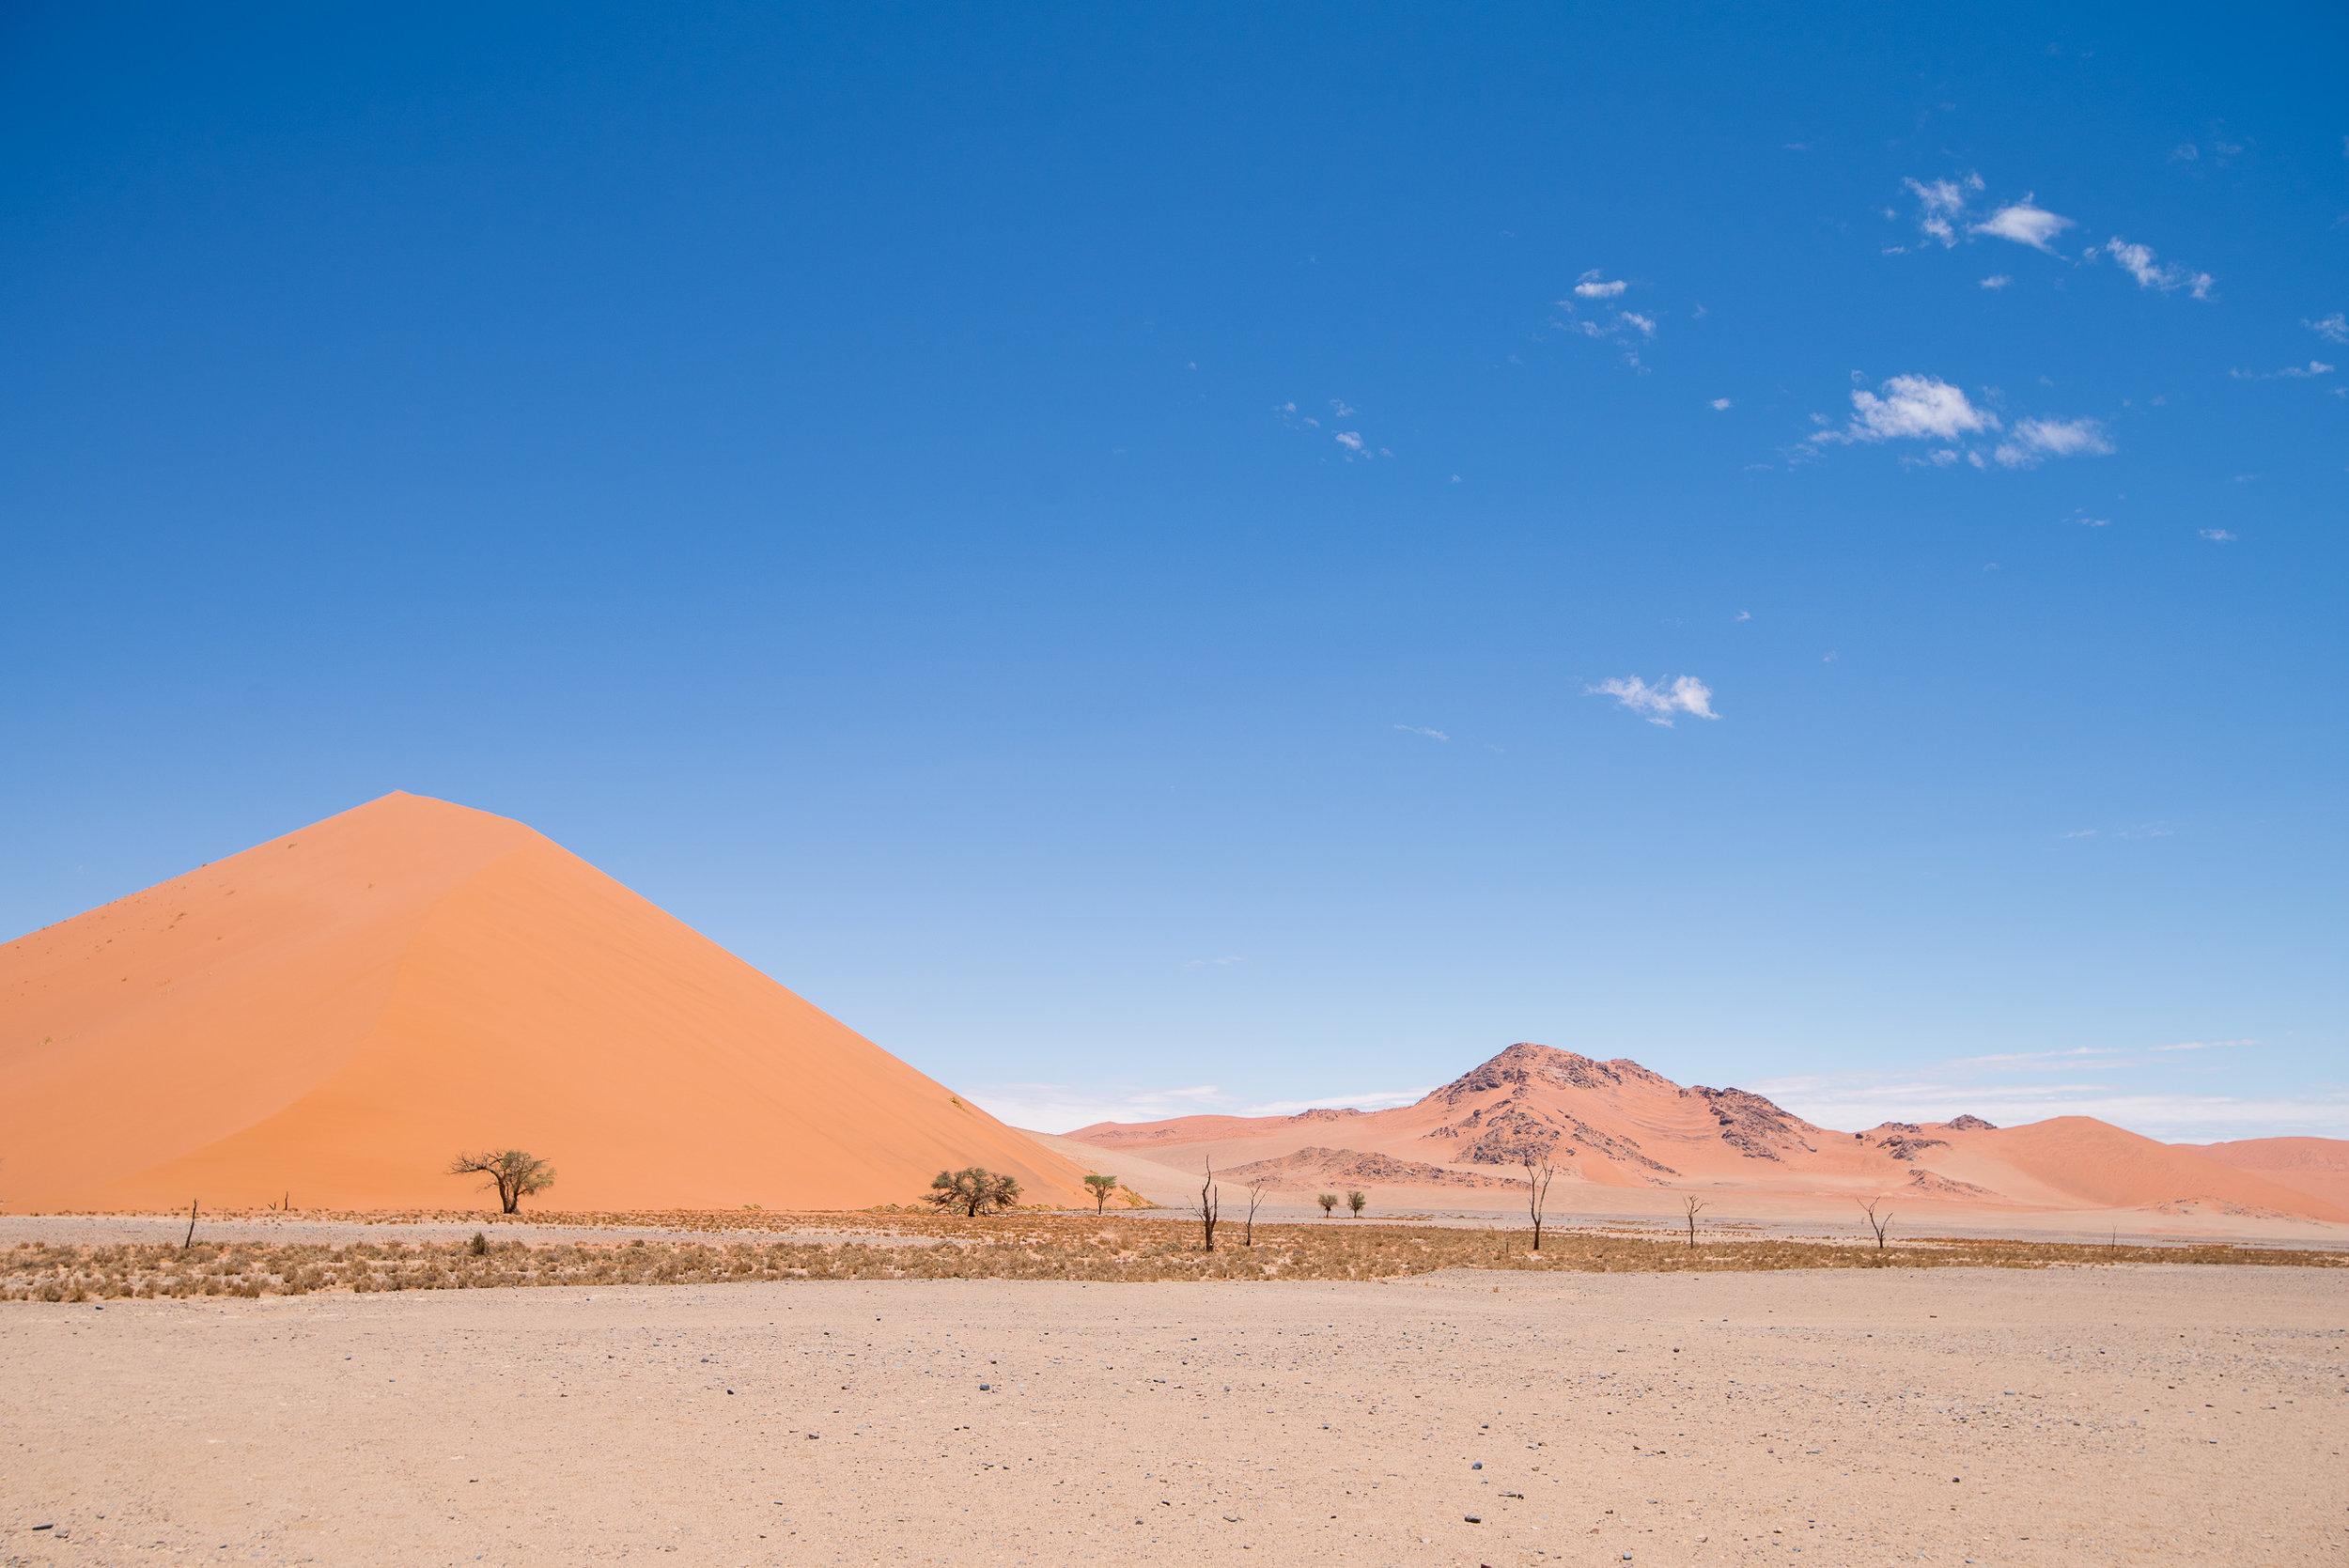 Dune 45, Namib Naukloft Park.